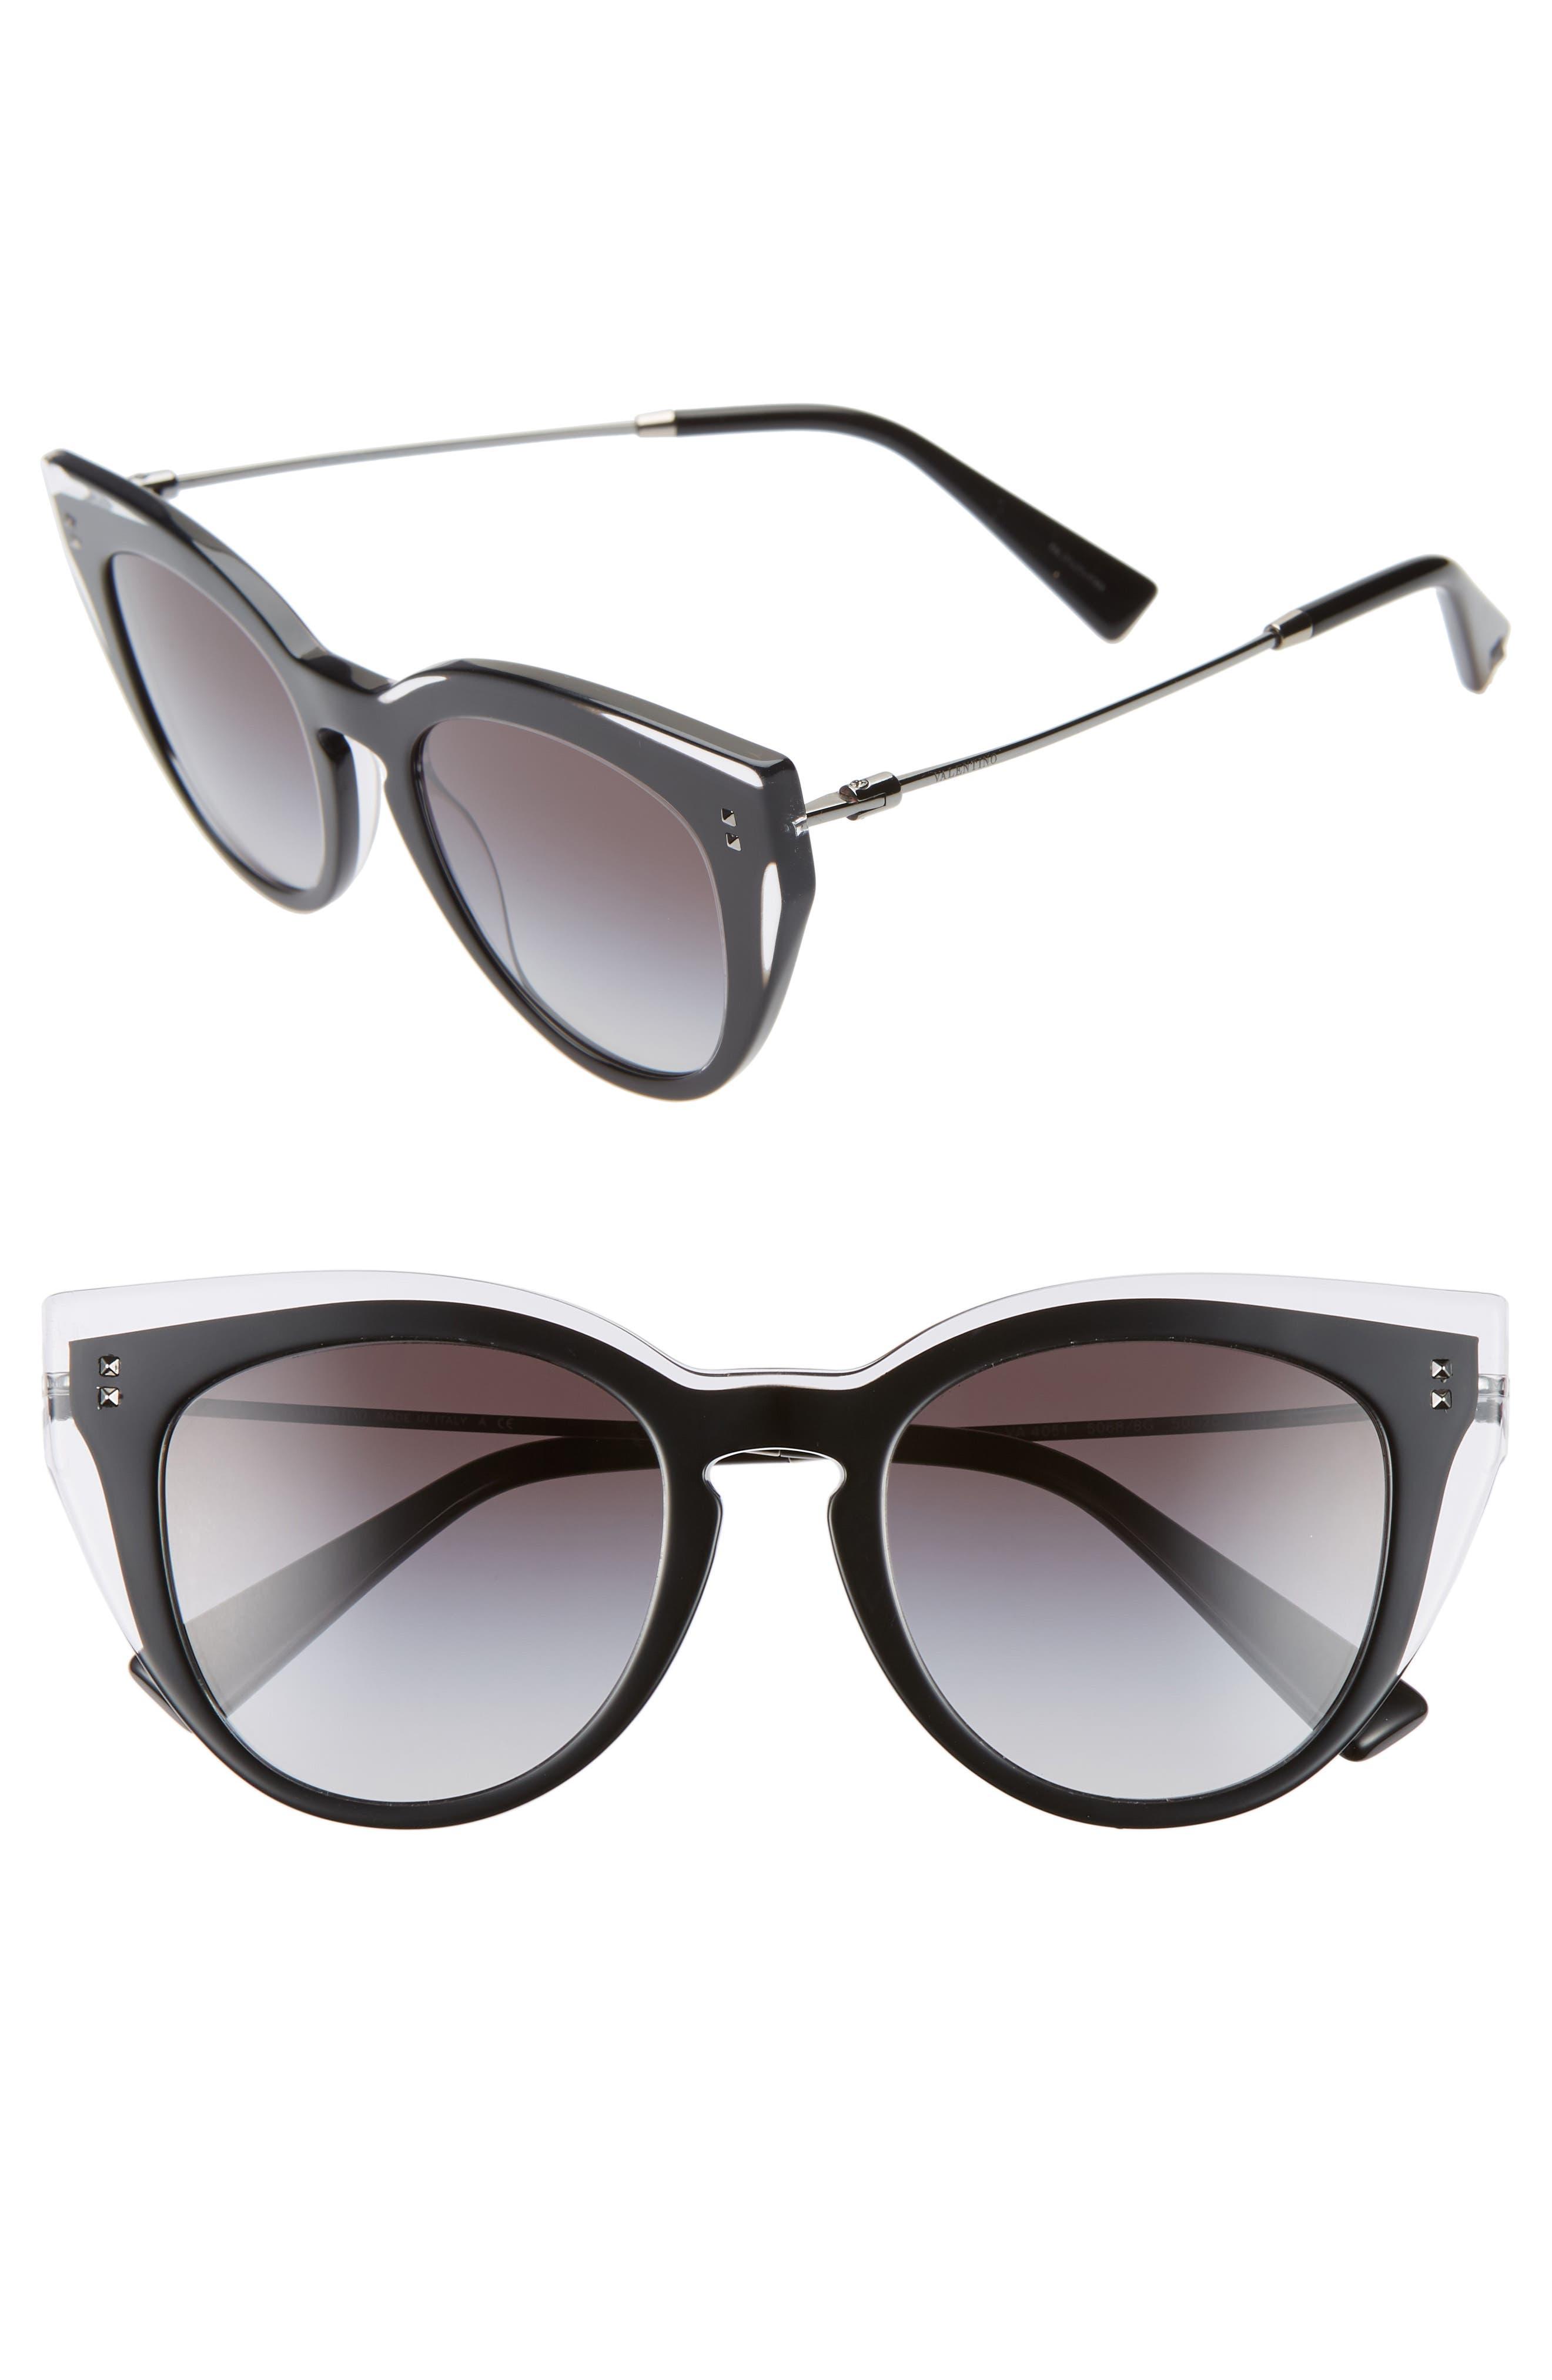 Valentino 50Mm Cat Eye Sunglasses - Black Crystal